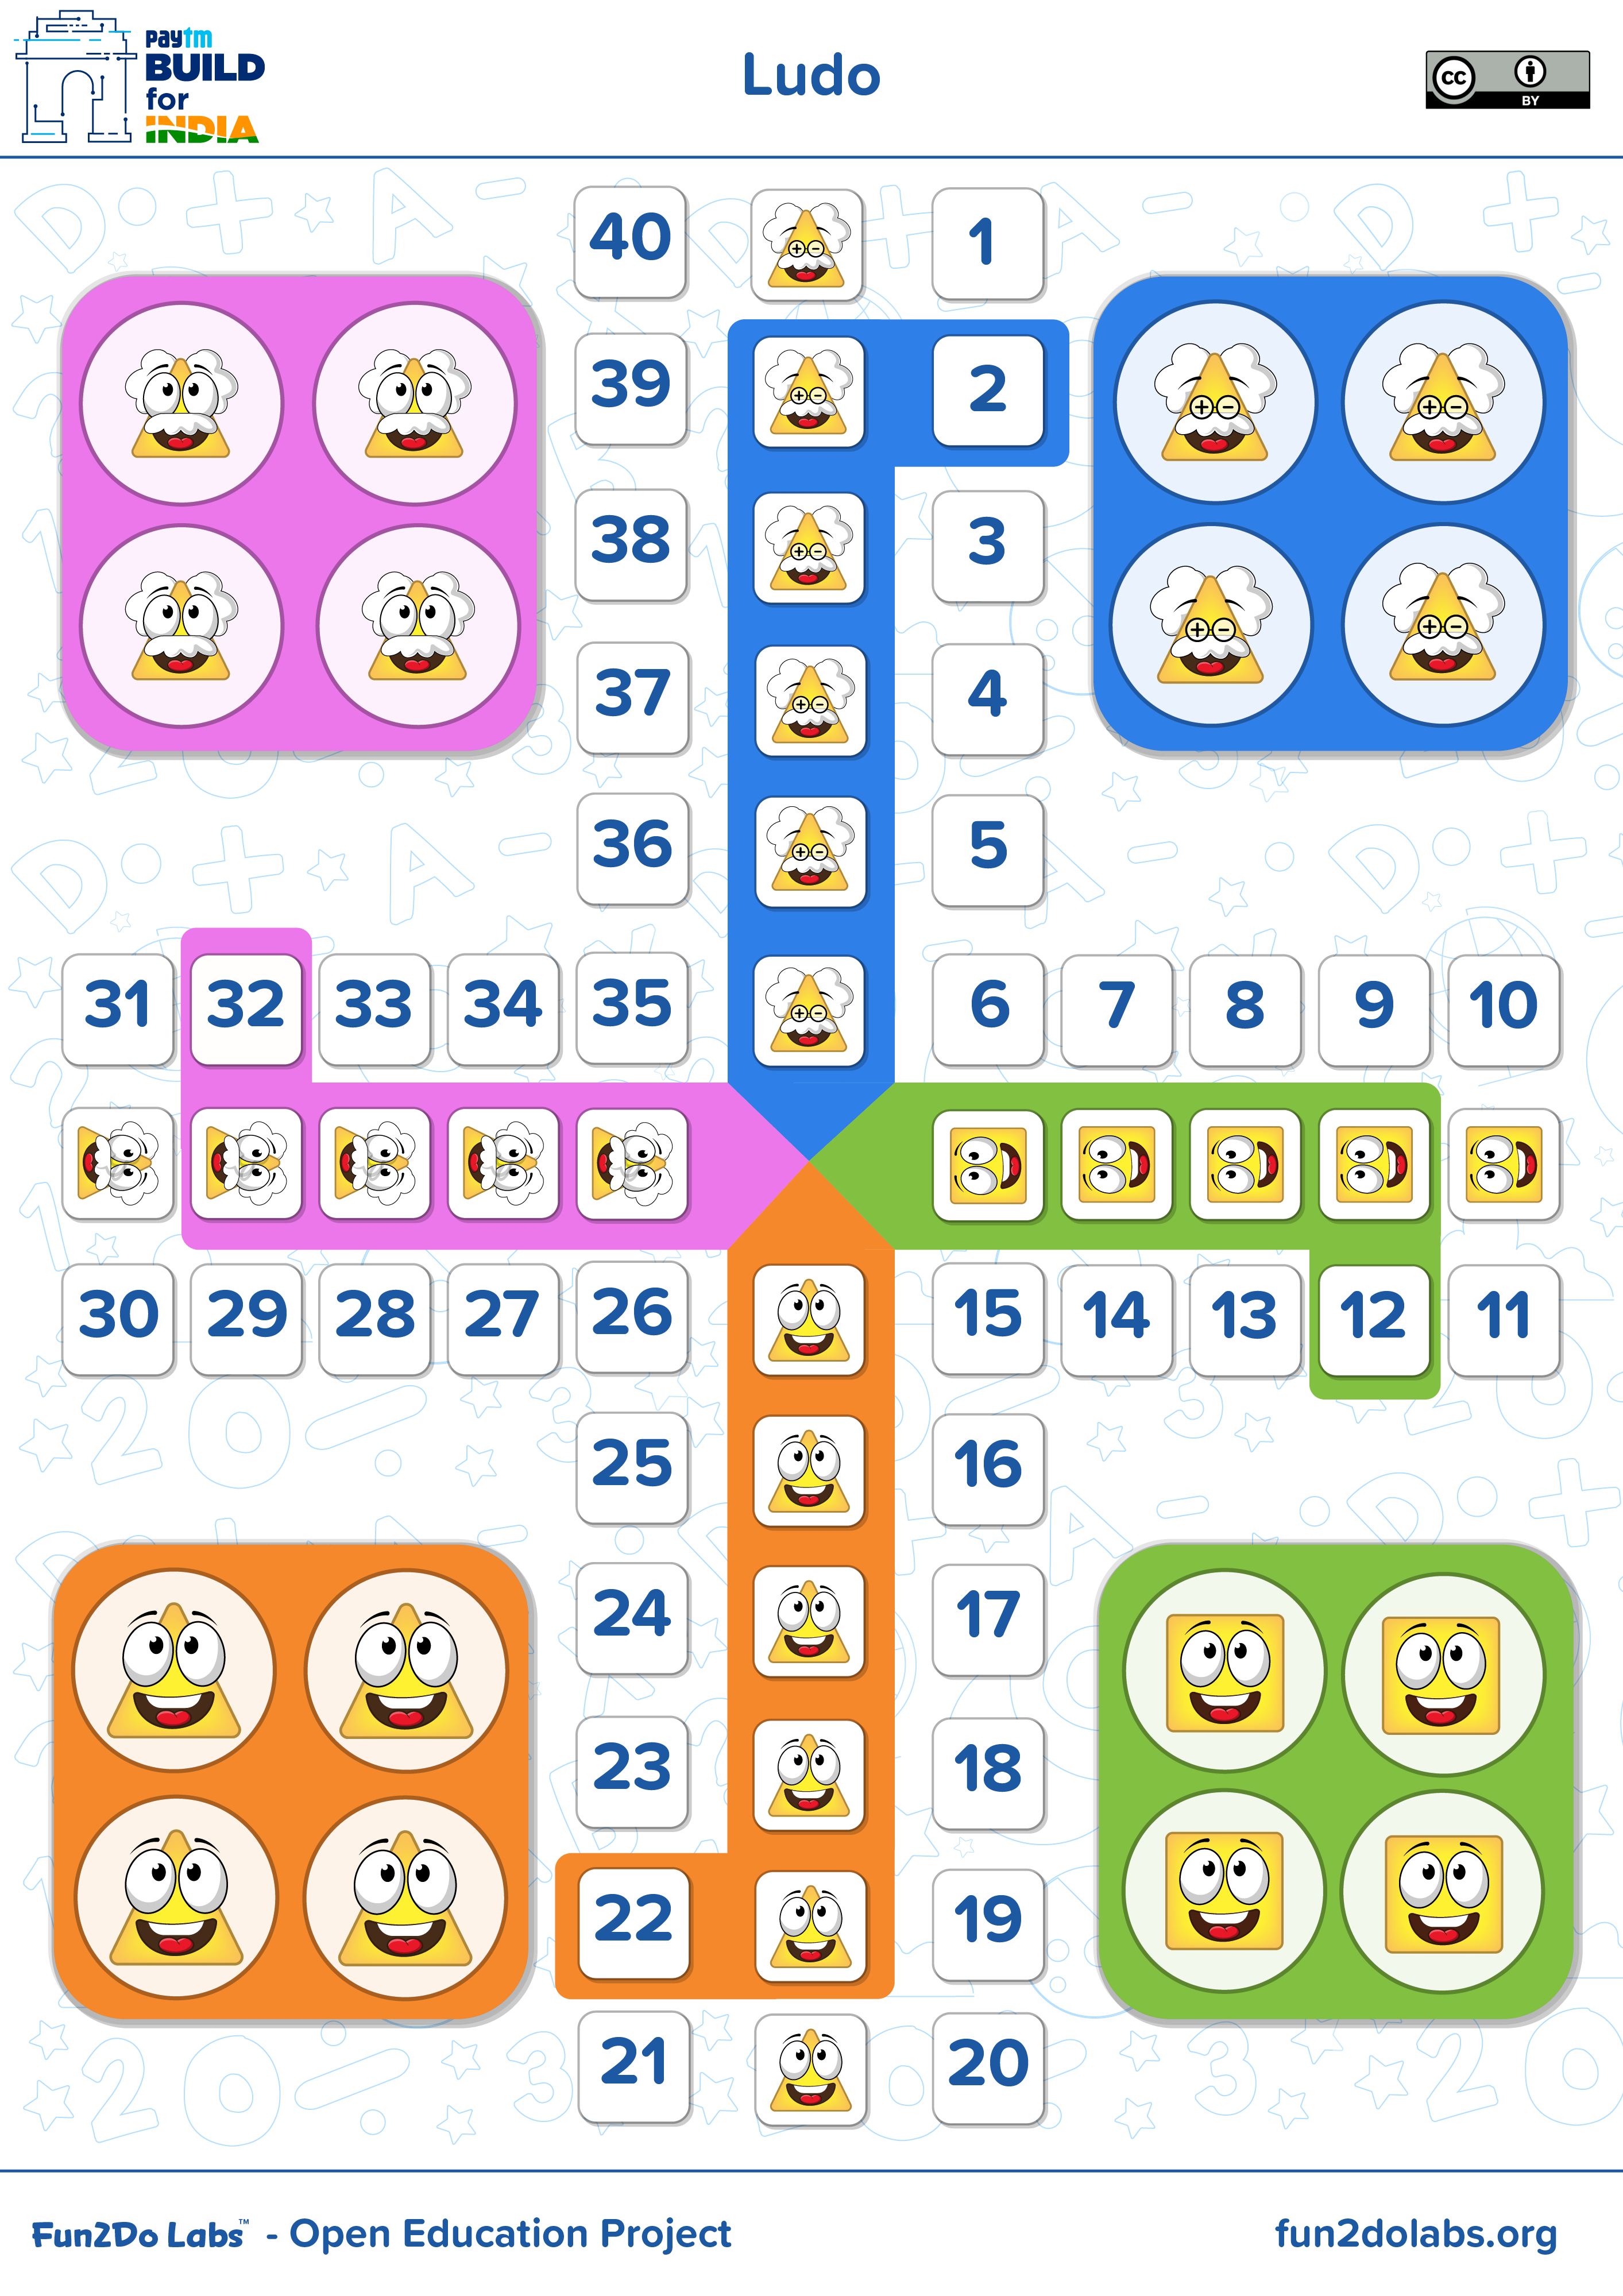 Ludo Printable, Ludo Board Game, Ludo Poster, Ludo Wala Game, Ludo - Free Printable Ludo Board